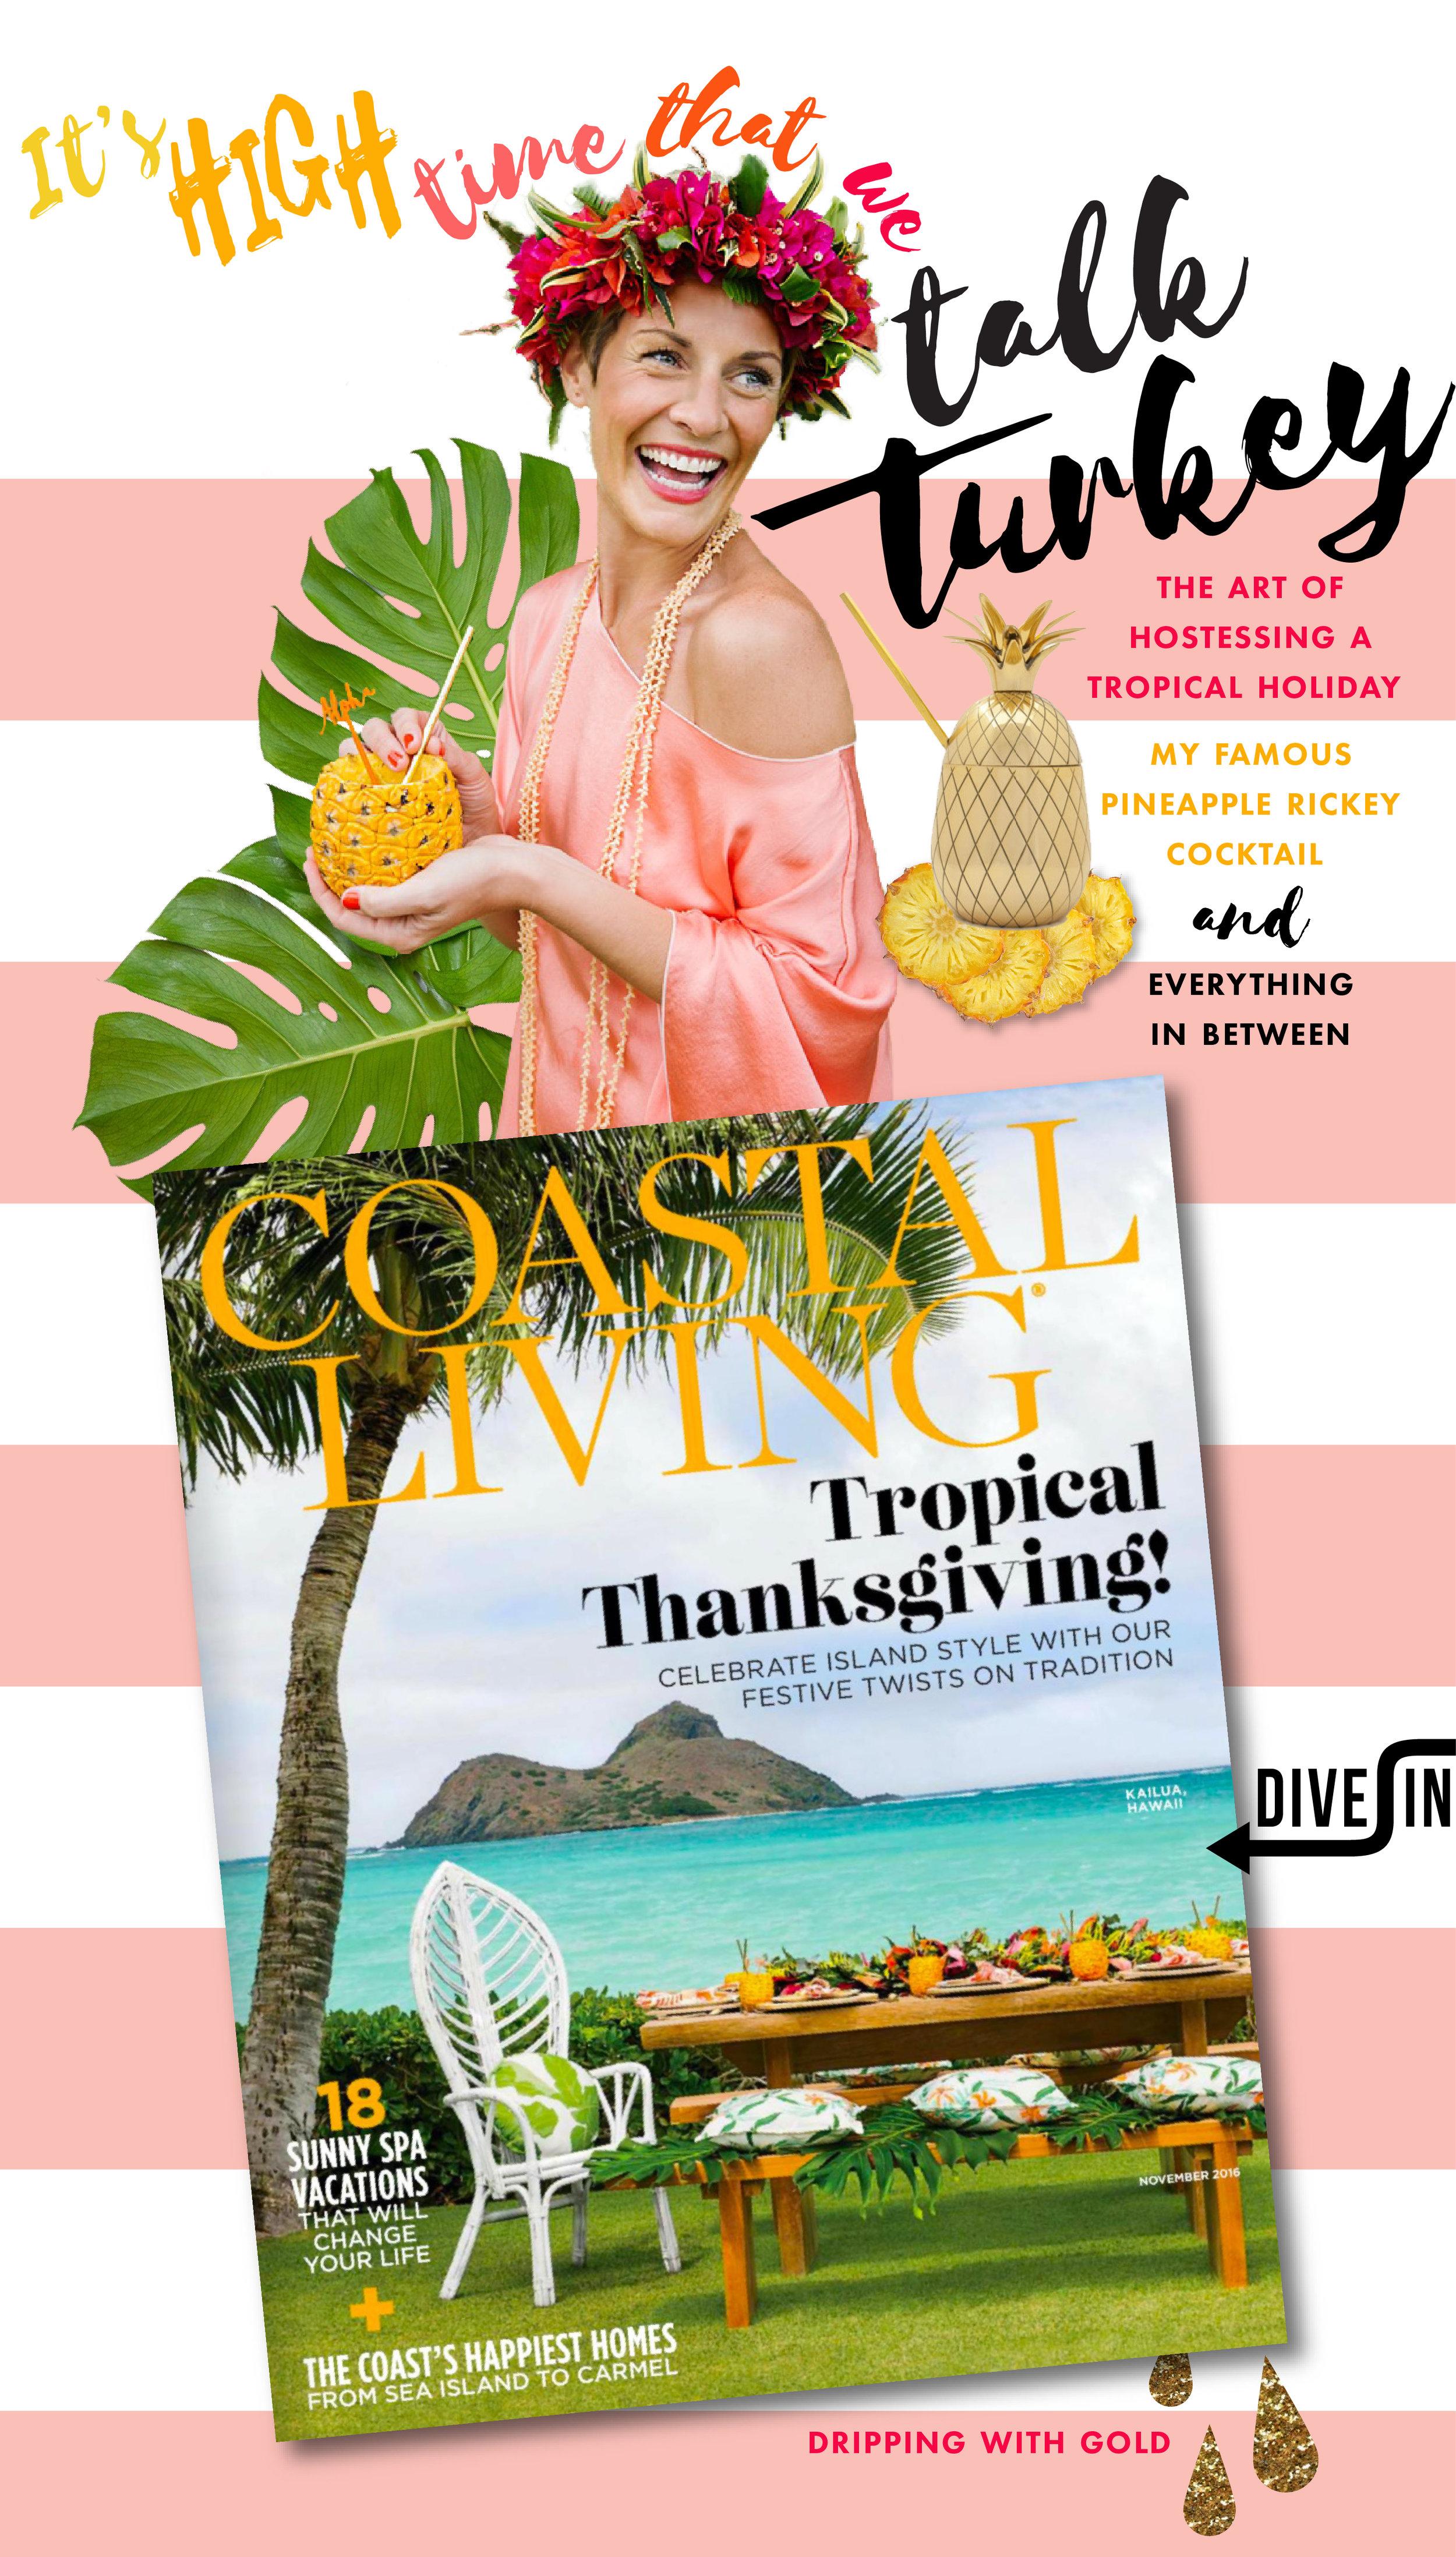 MRS_Coastal Living Nov16_cover-01.jpg